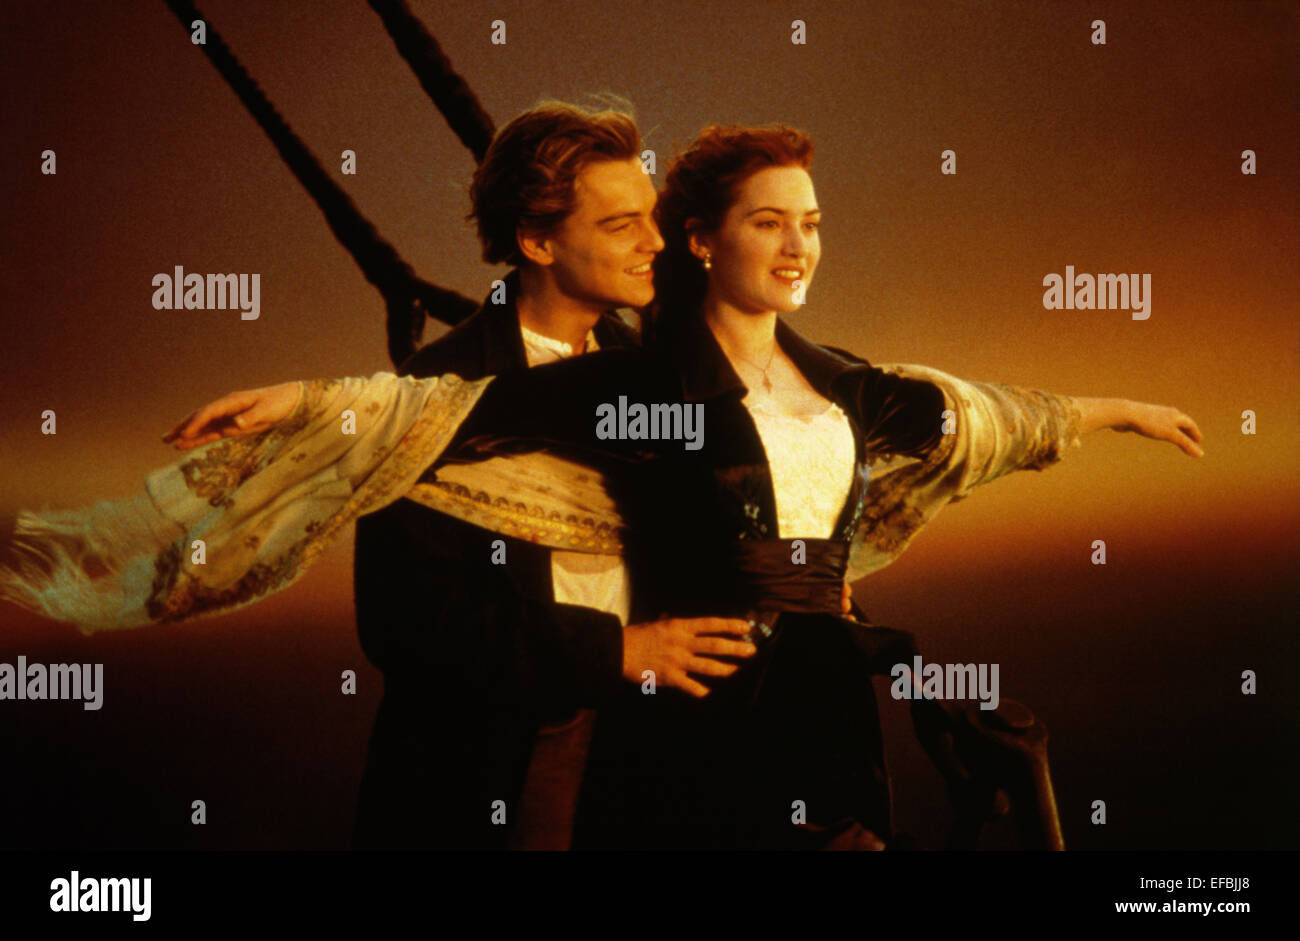 LEONARDO DICAPRIO, KATE WINSLET, TITANIC, 1997 - Stock Image